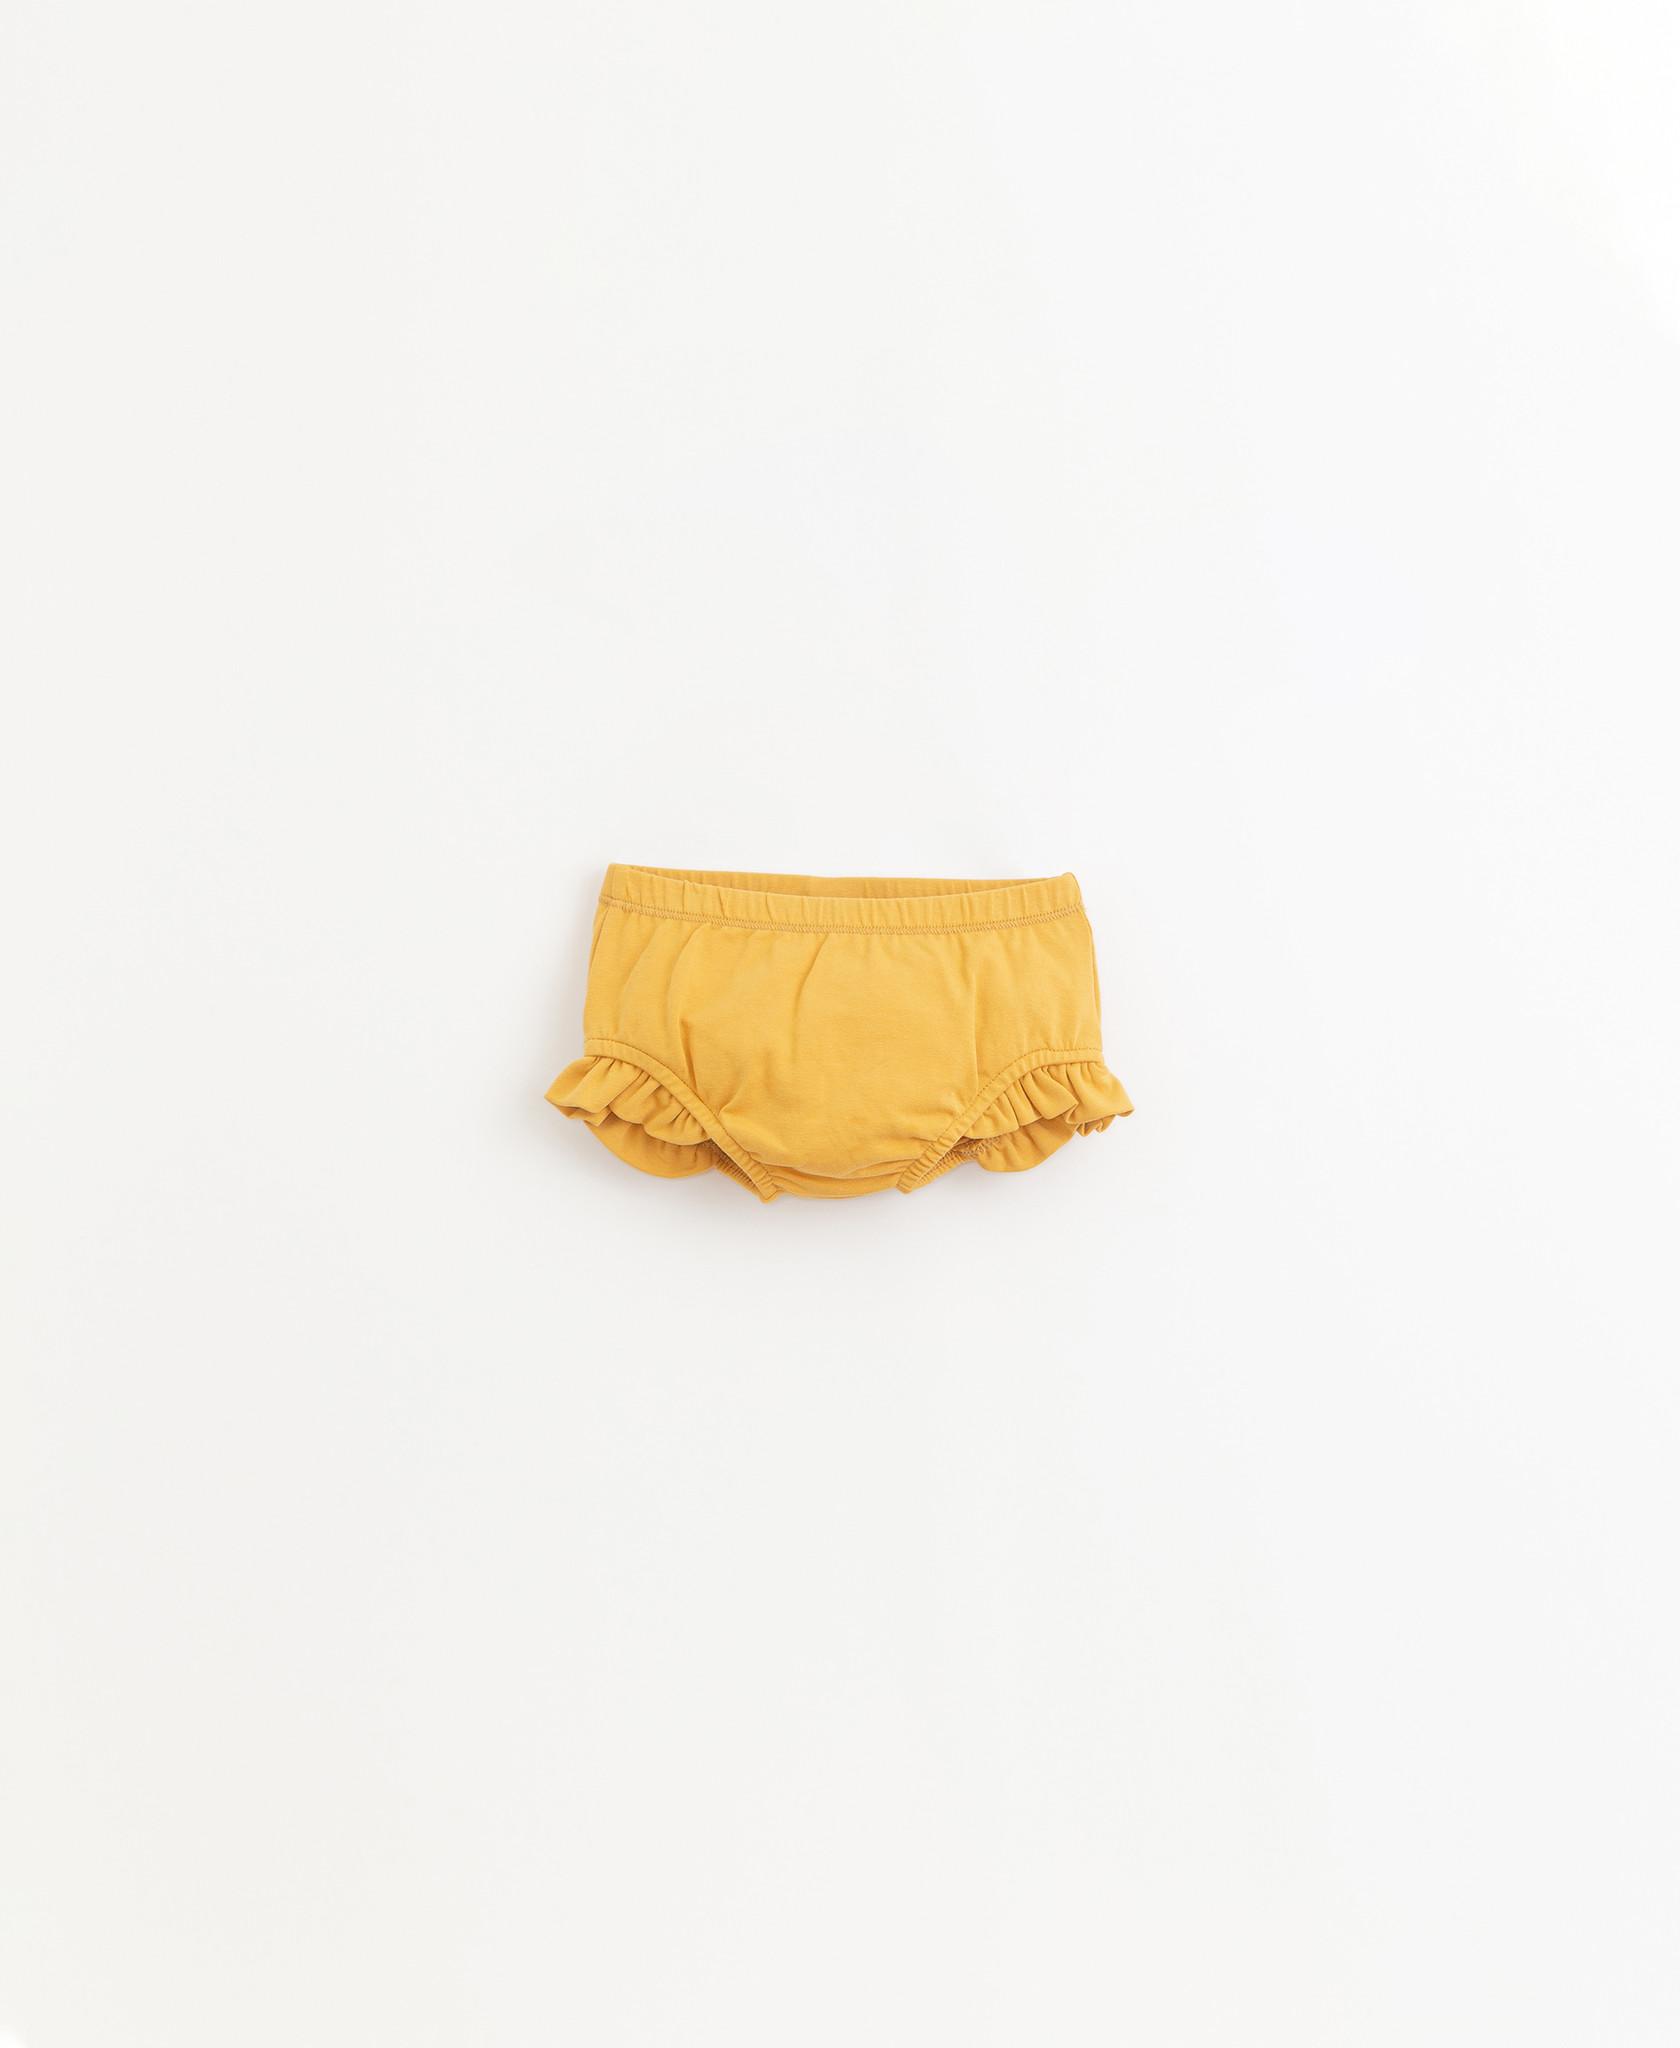 Play-up Lycra jersey underpants | Sunflower